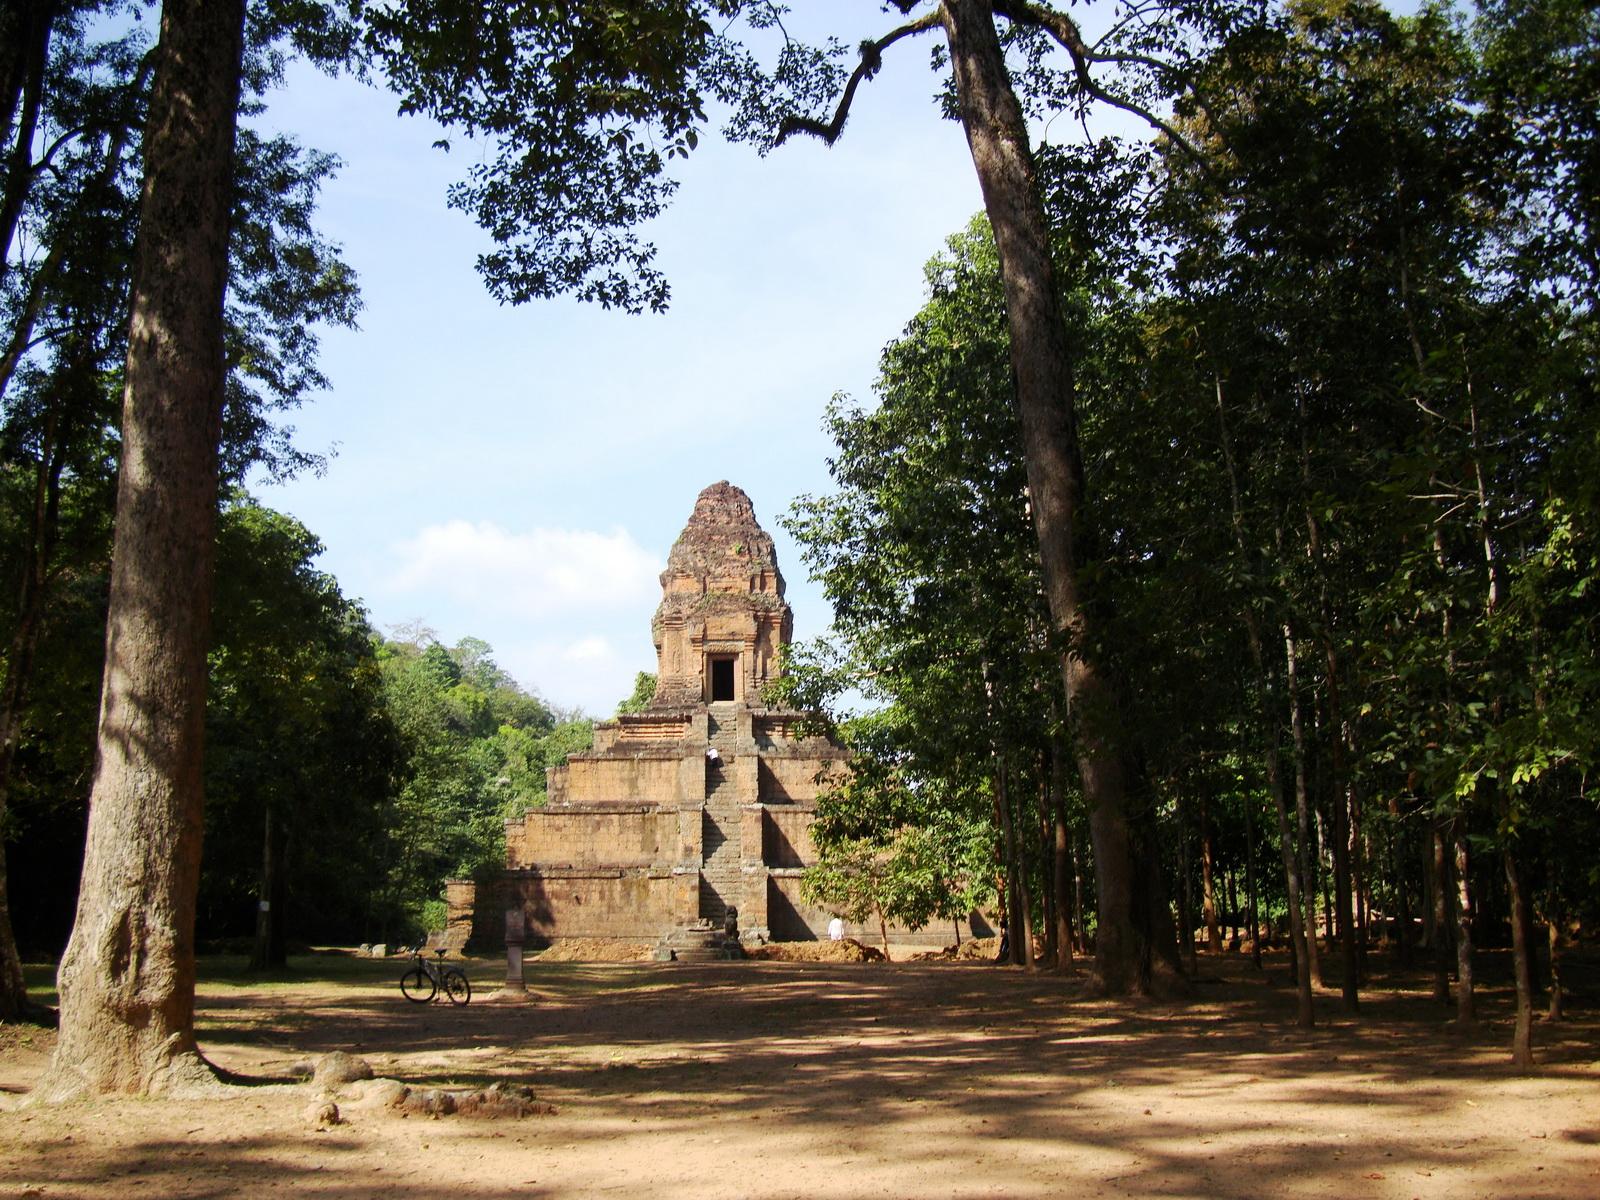 Baksei Chamkrong Temple Angkor Siem Reap Cambodia Jan 2010 03